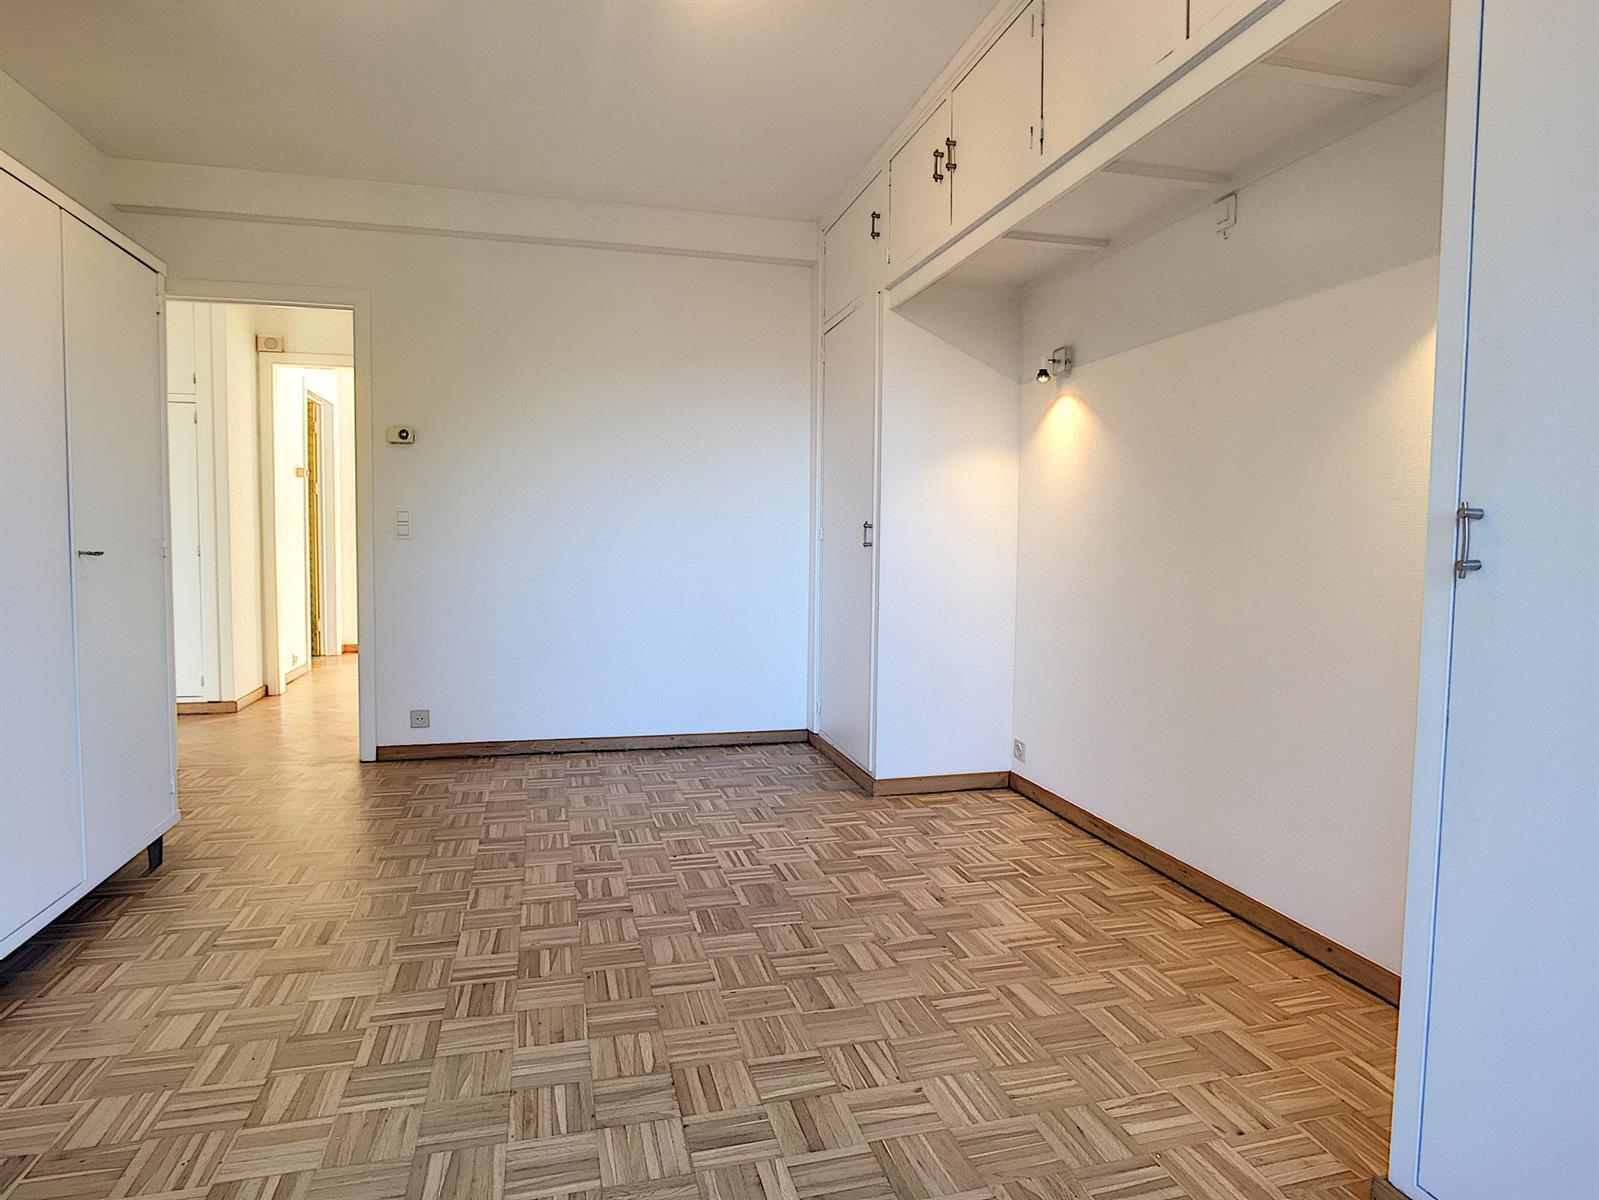 Flat - Auderghem - #4197560-6